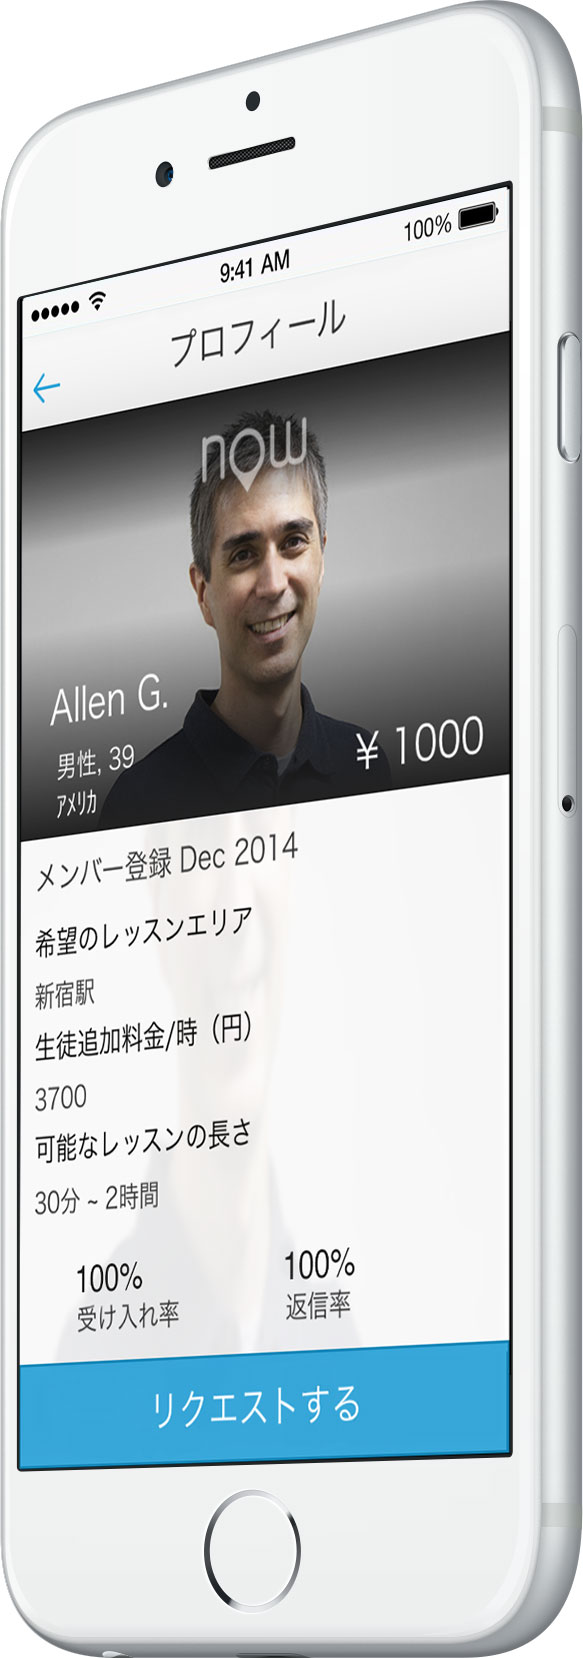 teacher_Allen_side.jpg